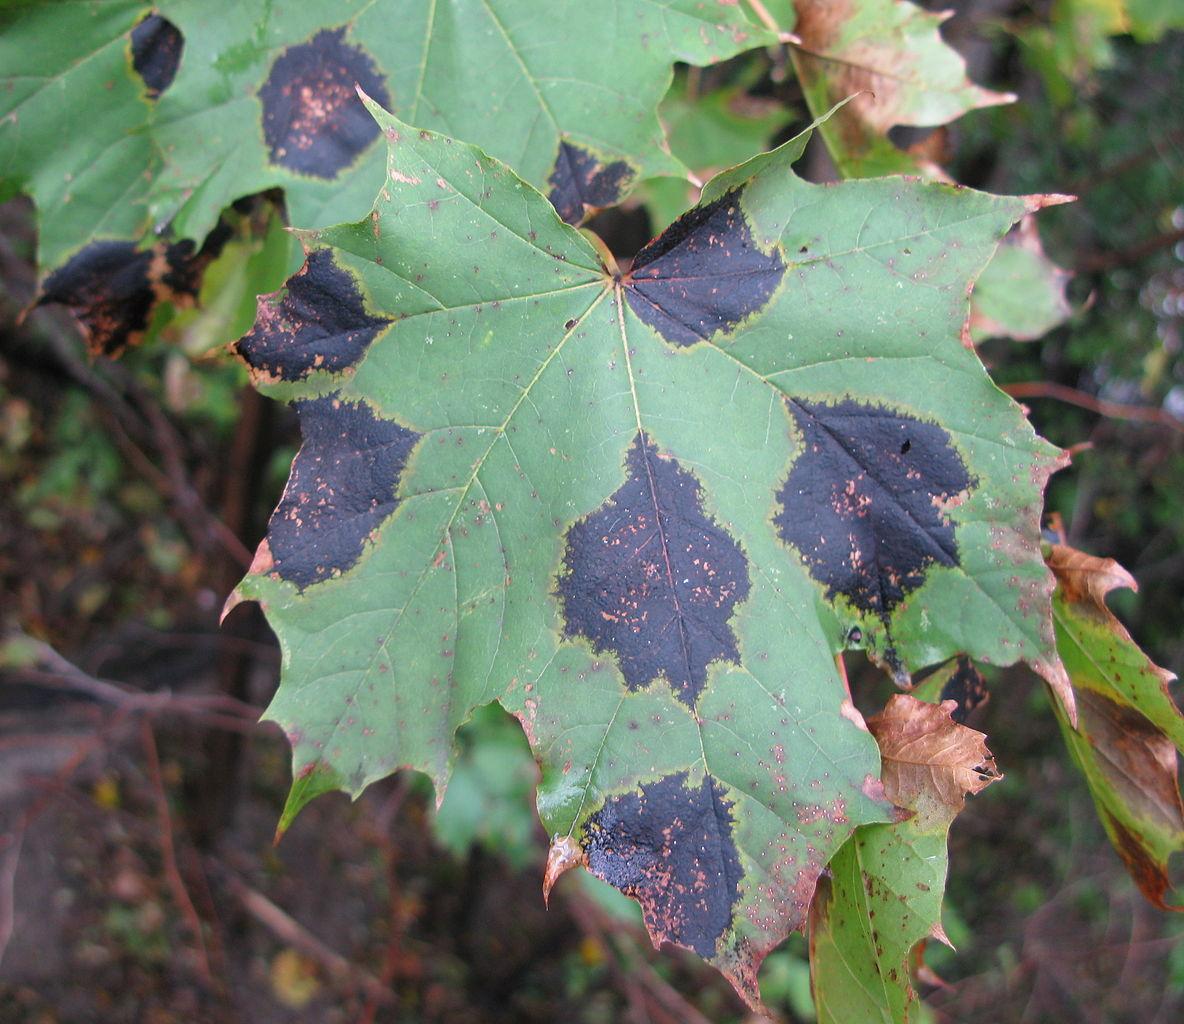 black tar spot on maple